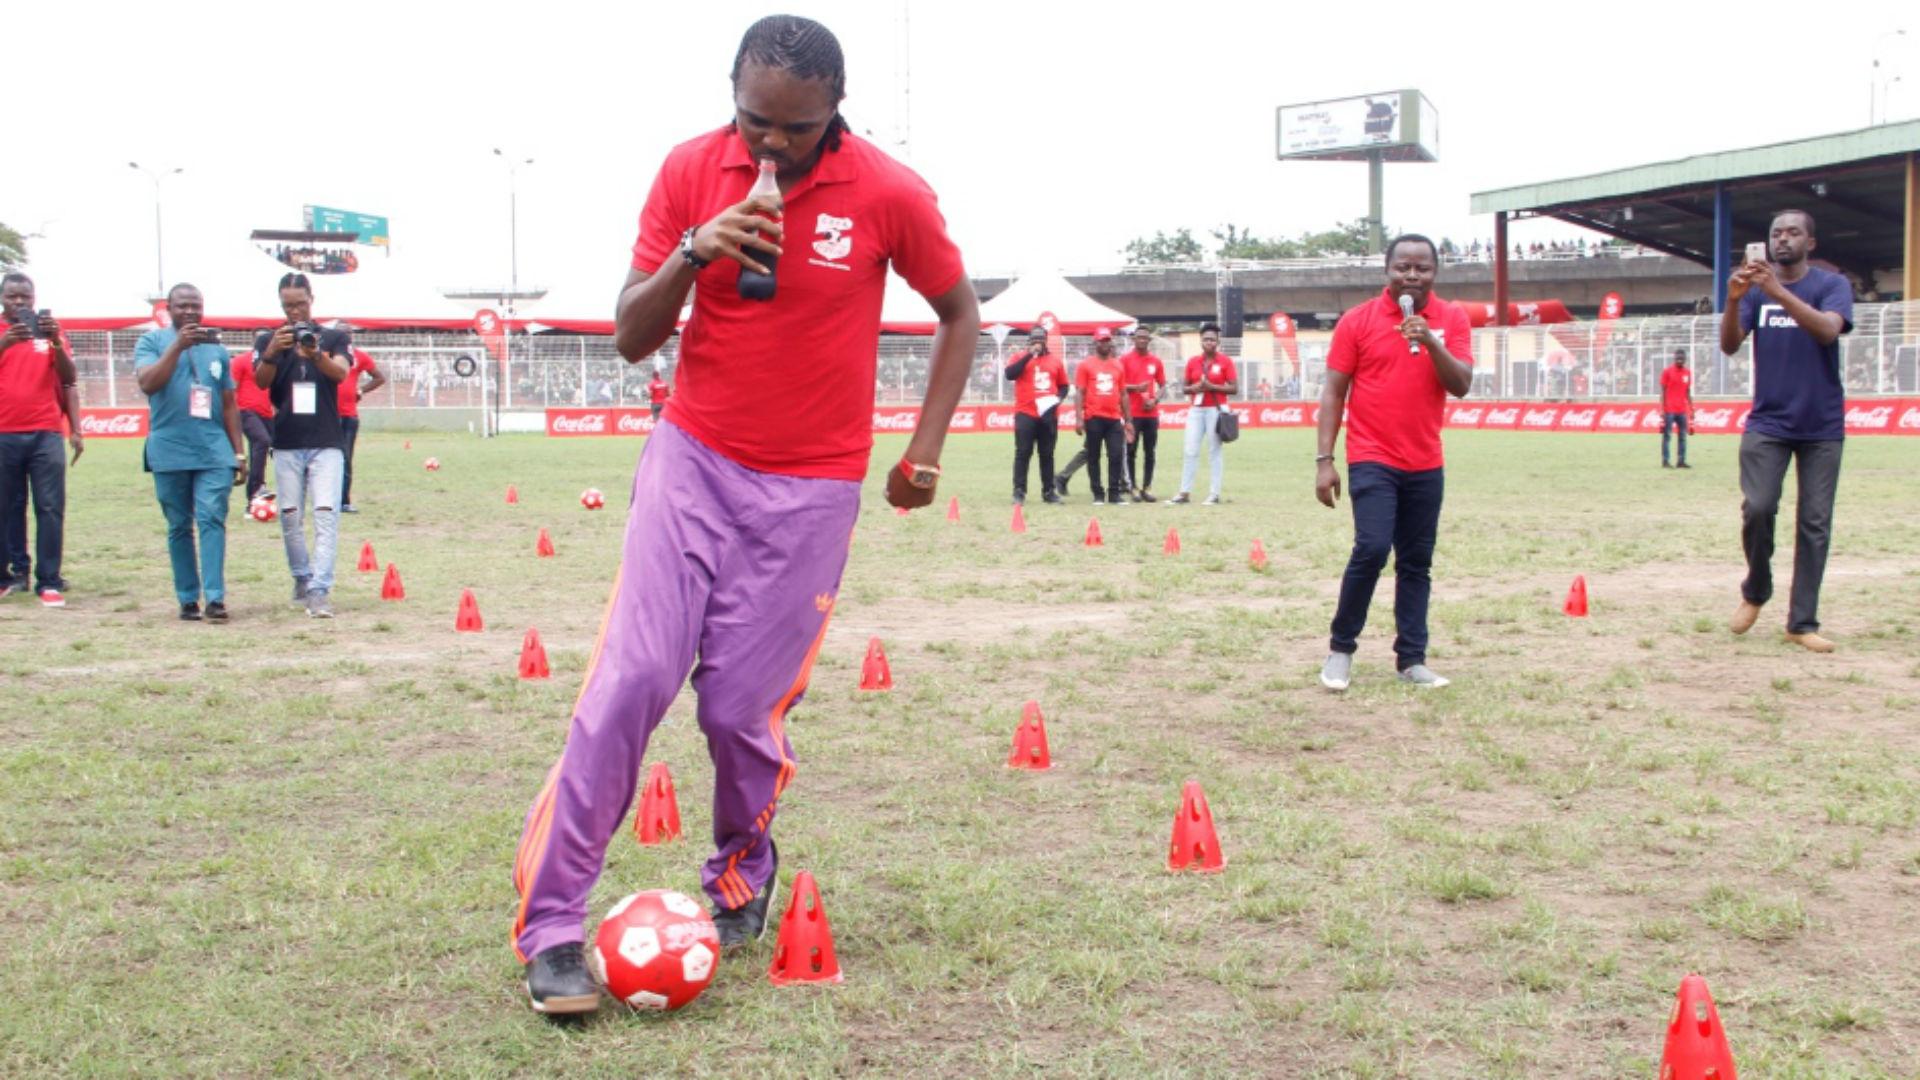 Kanu Nwankwo showing skills during Dare The COPA legends Stunt